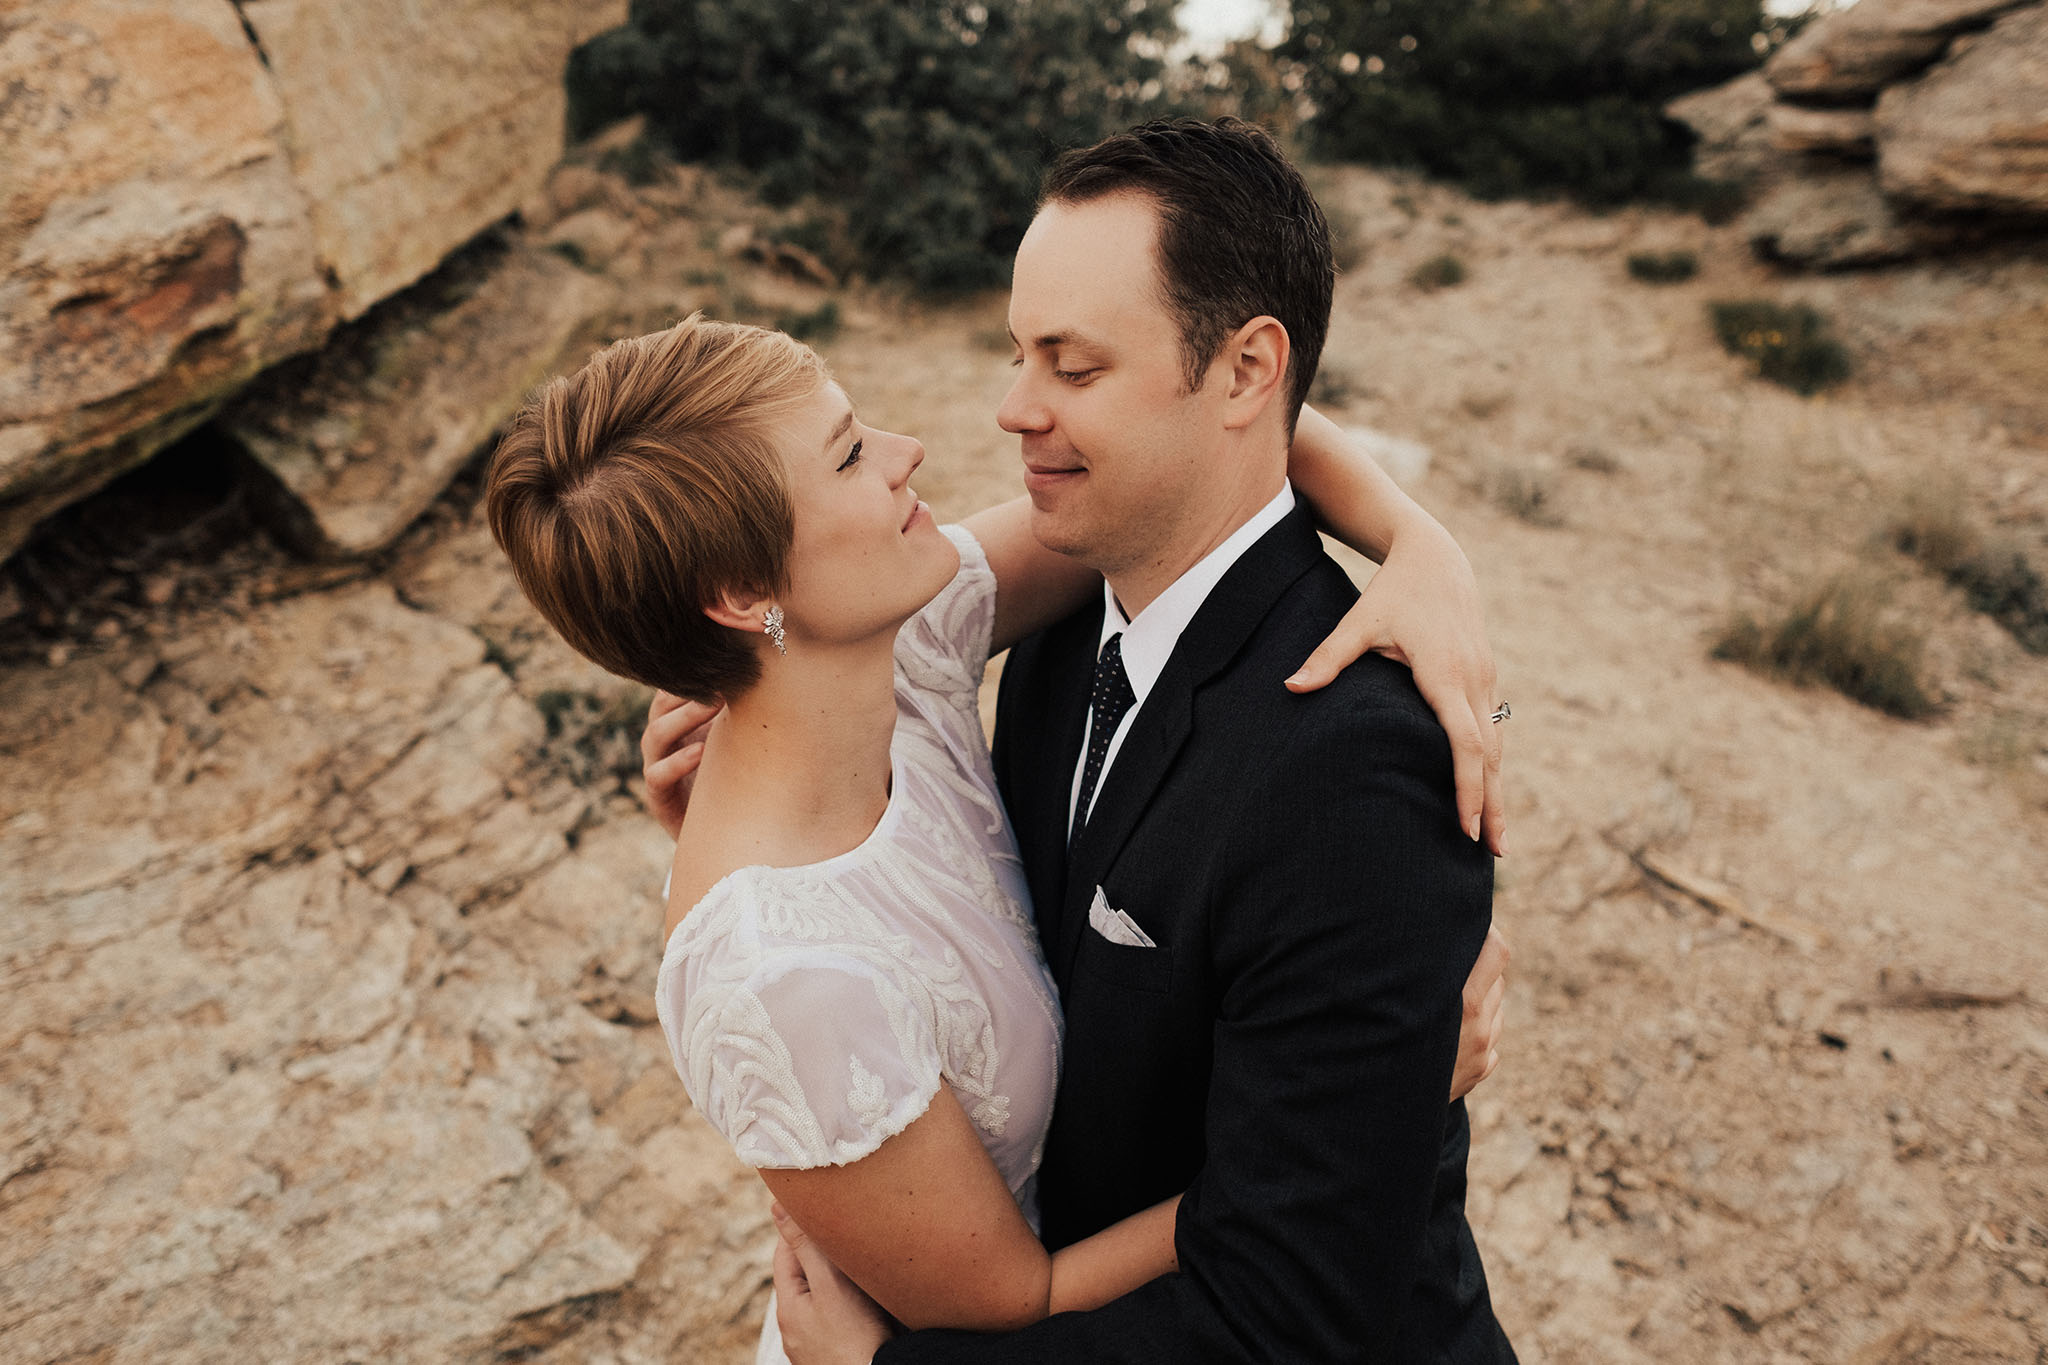 Arizona-Intimate-Elopement-Adventure-Photographer-Mount-Lemmon (24).jpg